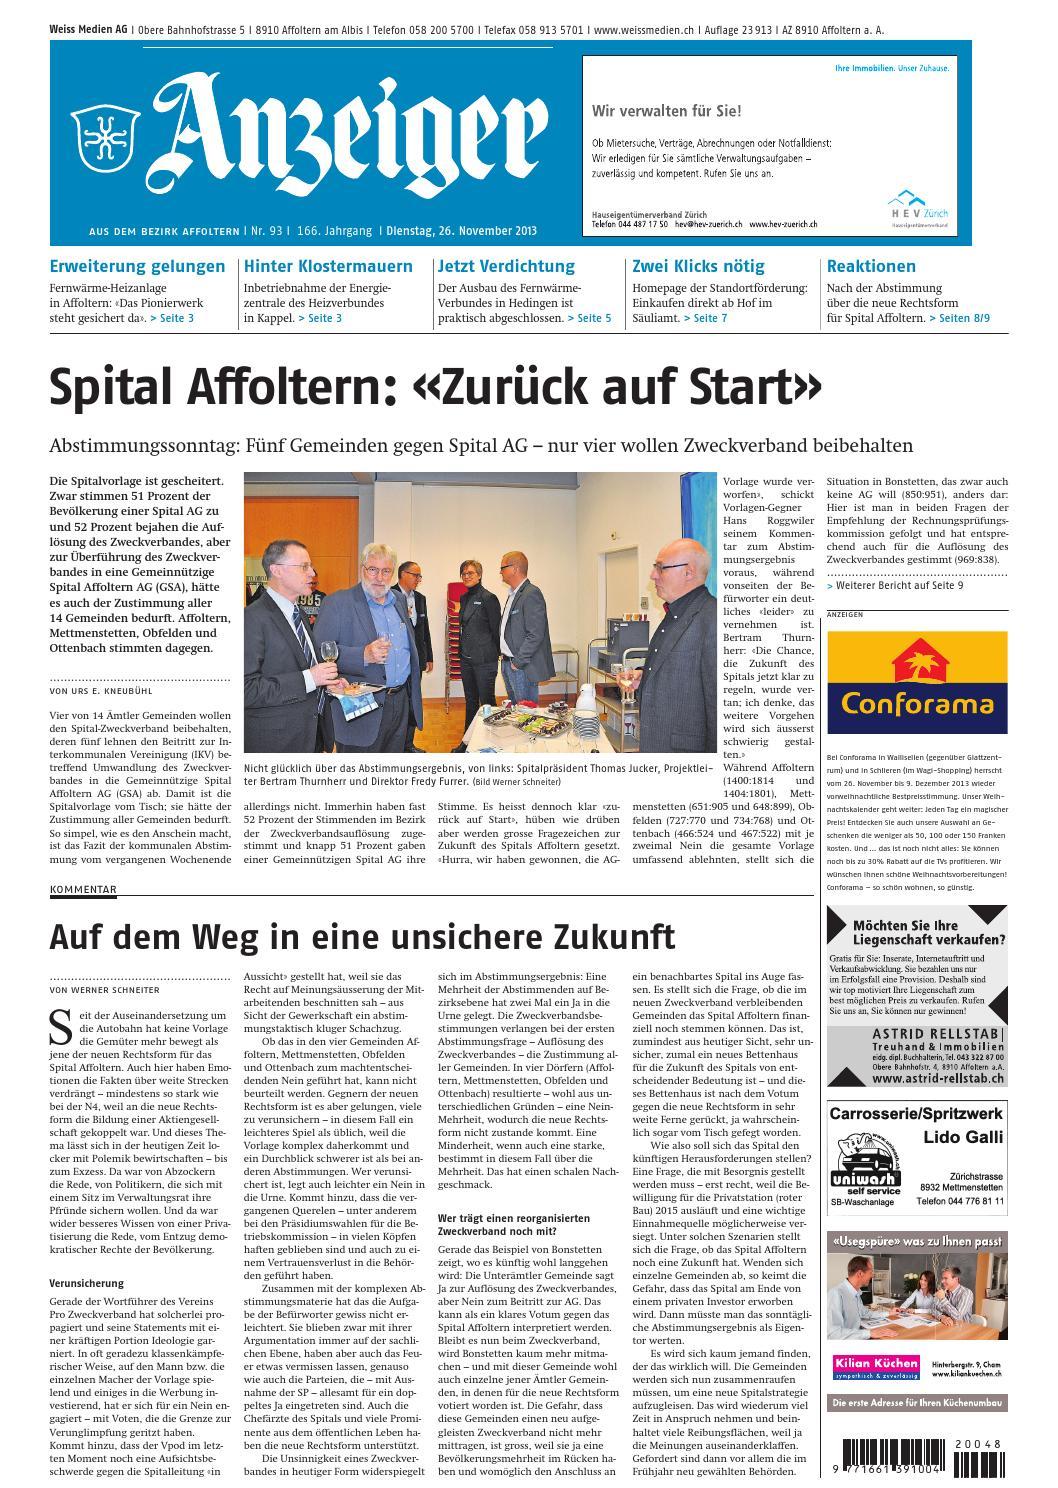 093 2013 by AZ-Anzeiger - issuu